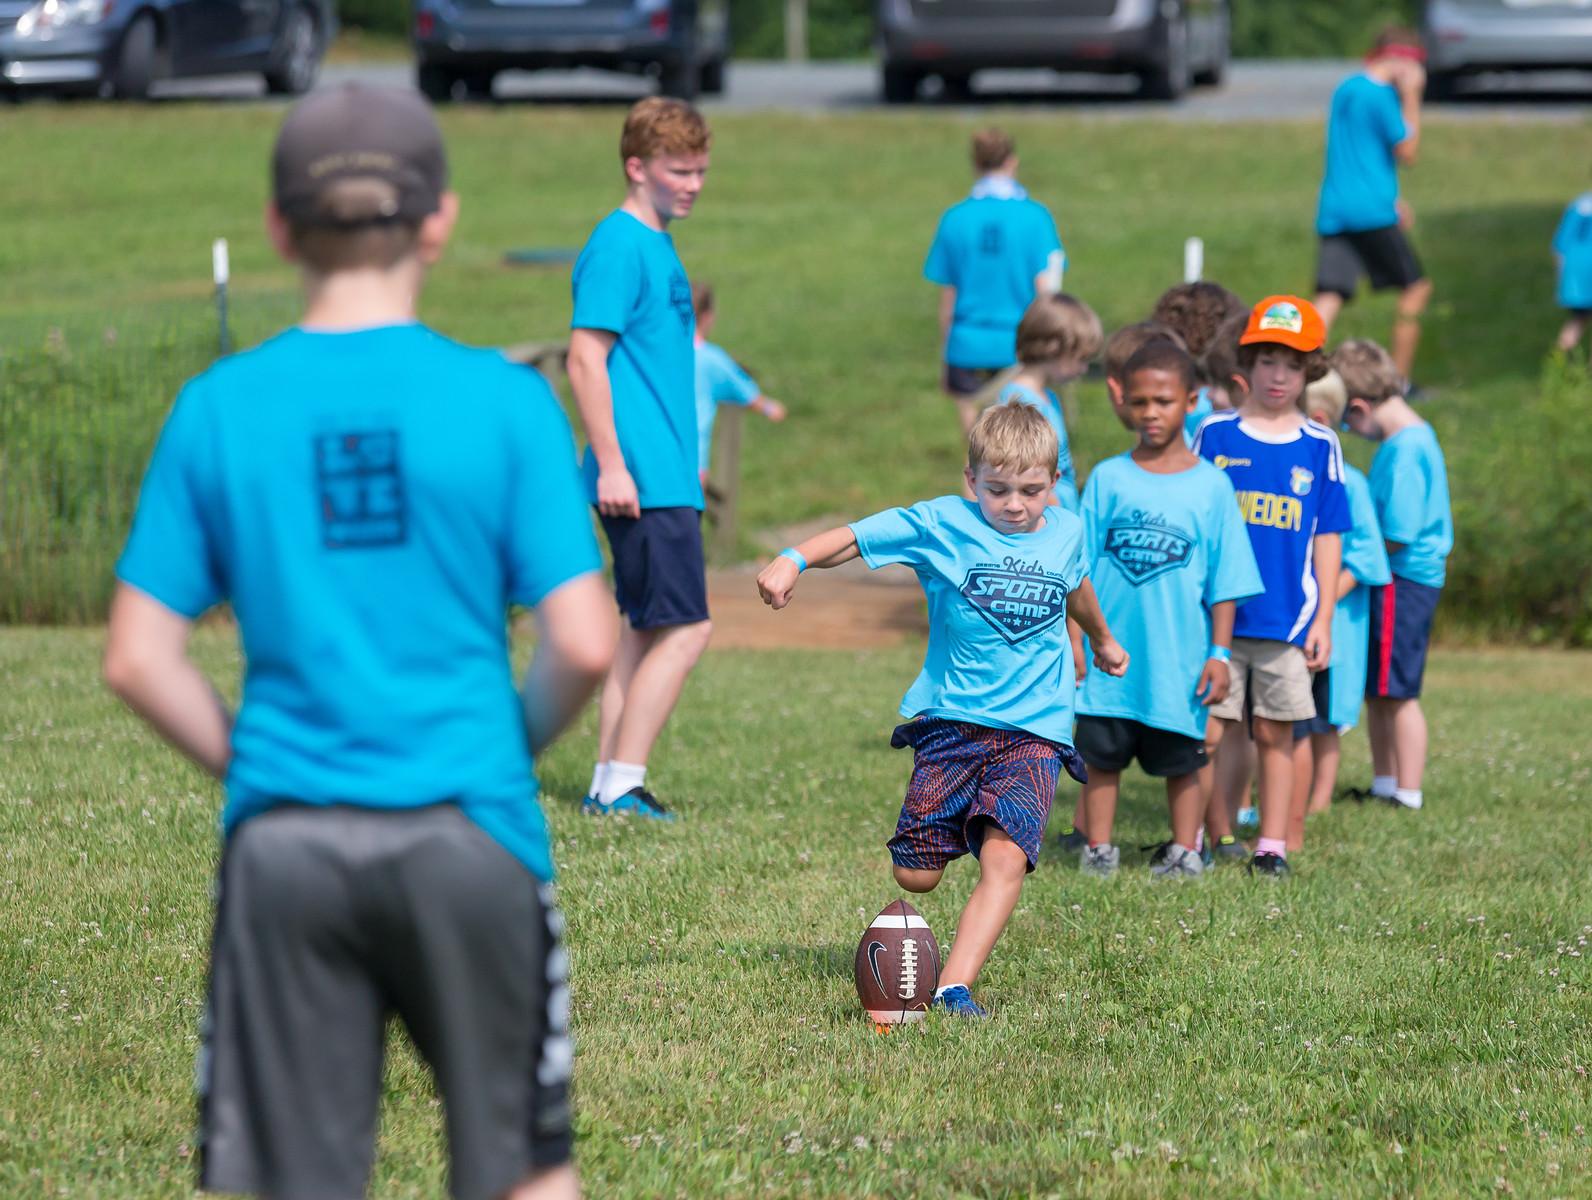 07-16 Sports Camp_-121-X3.jpg